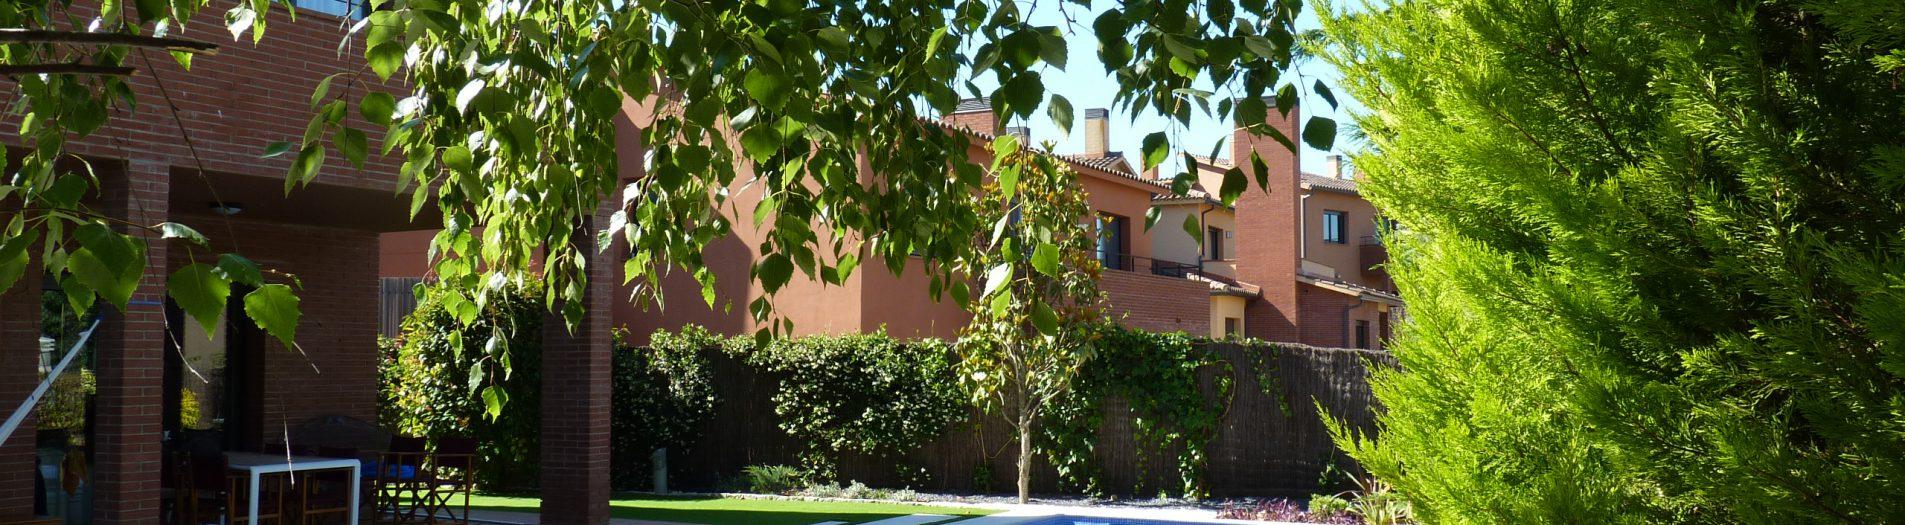 Jardí i piscina a Santa Agnès